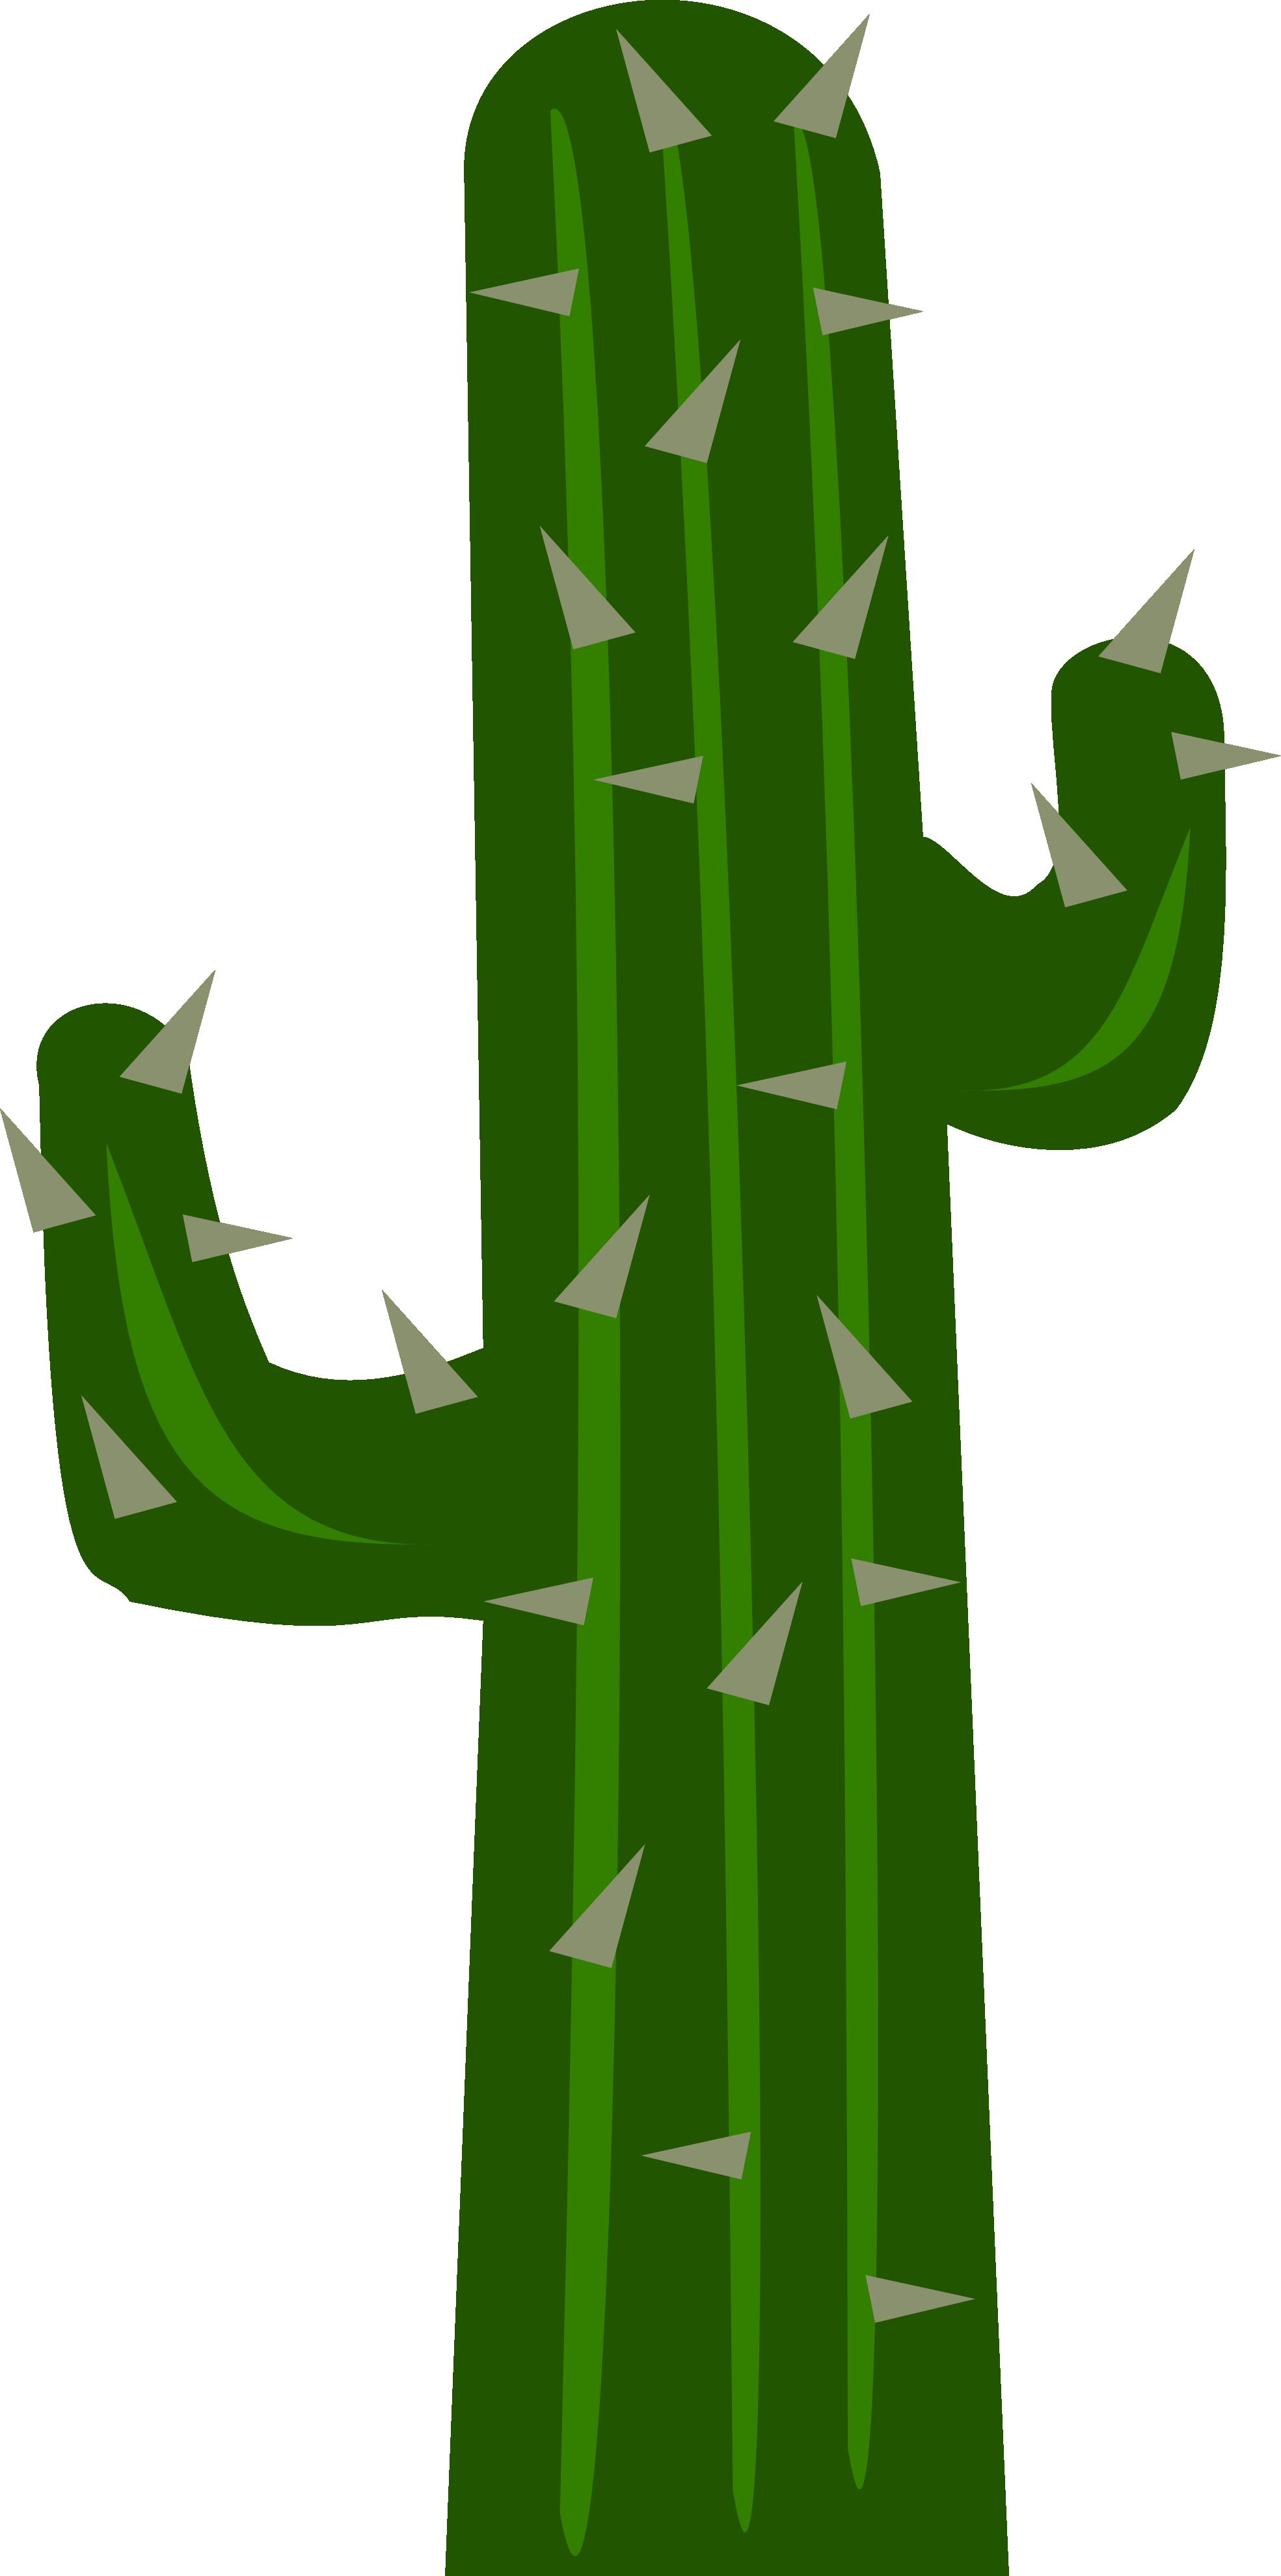 Cactus Clip Art - ClipArt Best